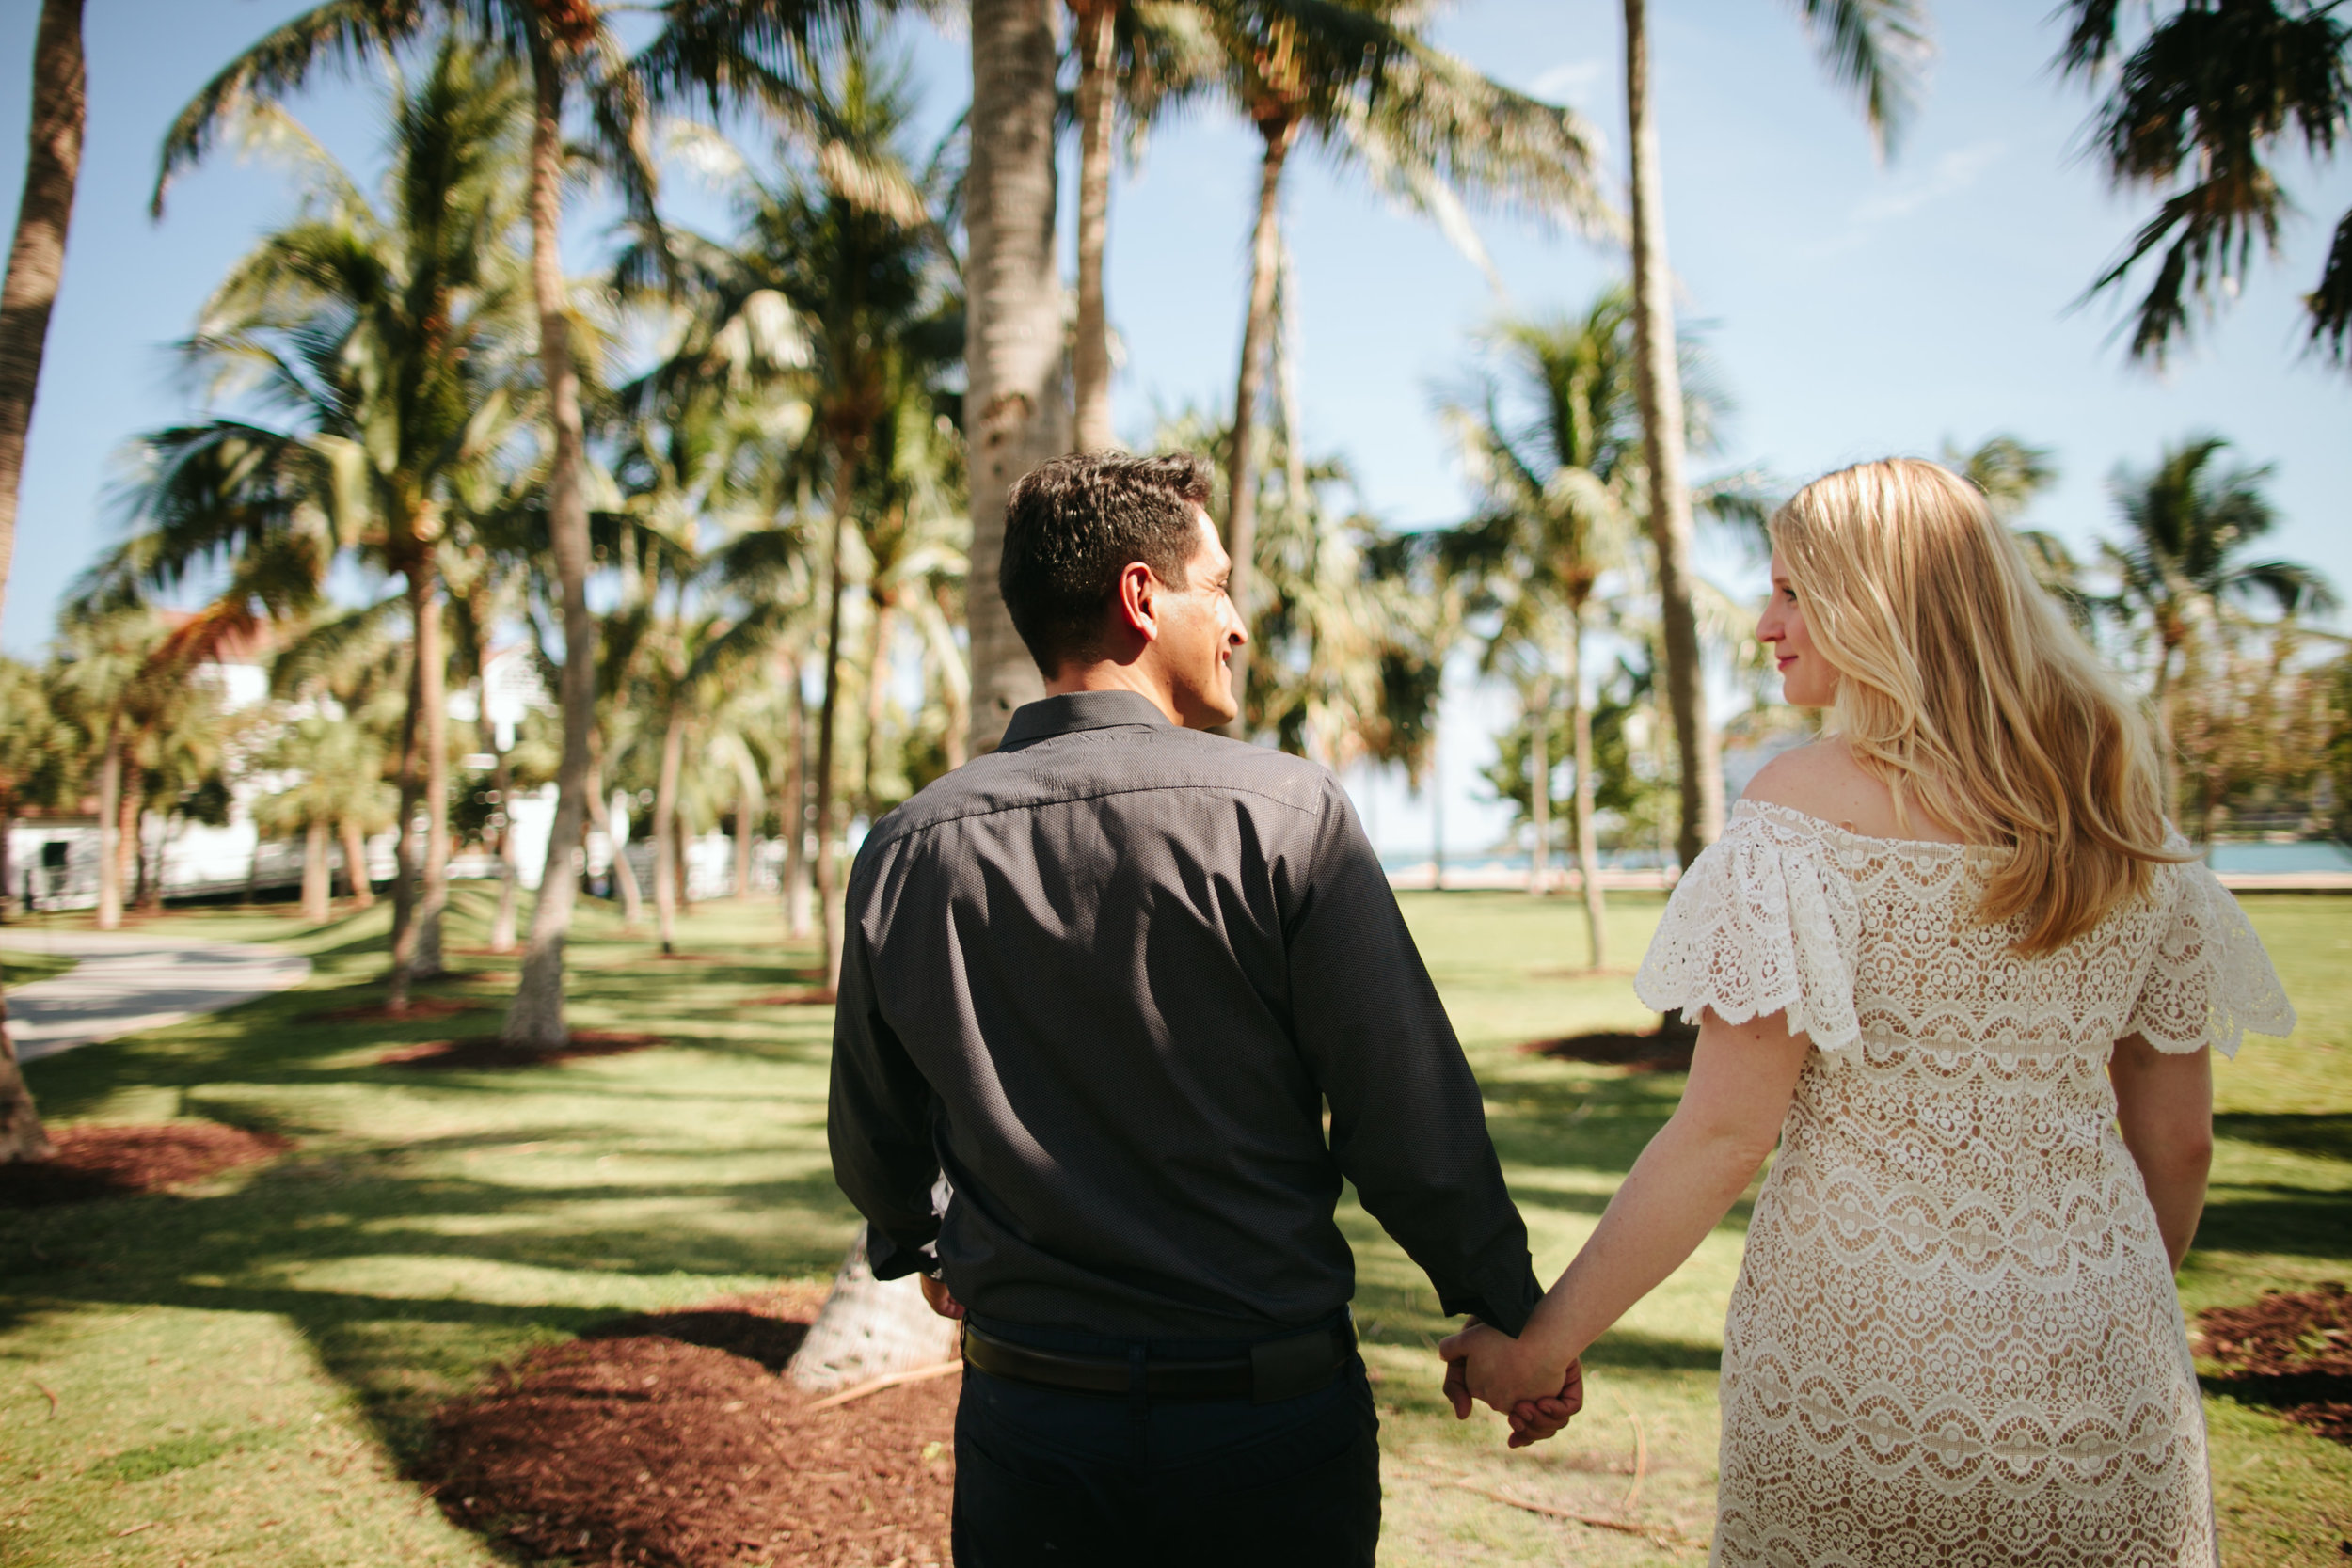 Miami Beach Engagement at South Pointe Park (1).jpg